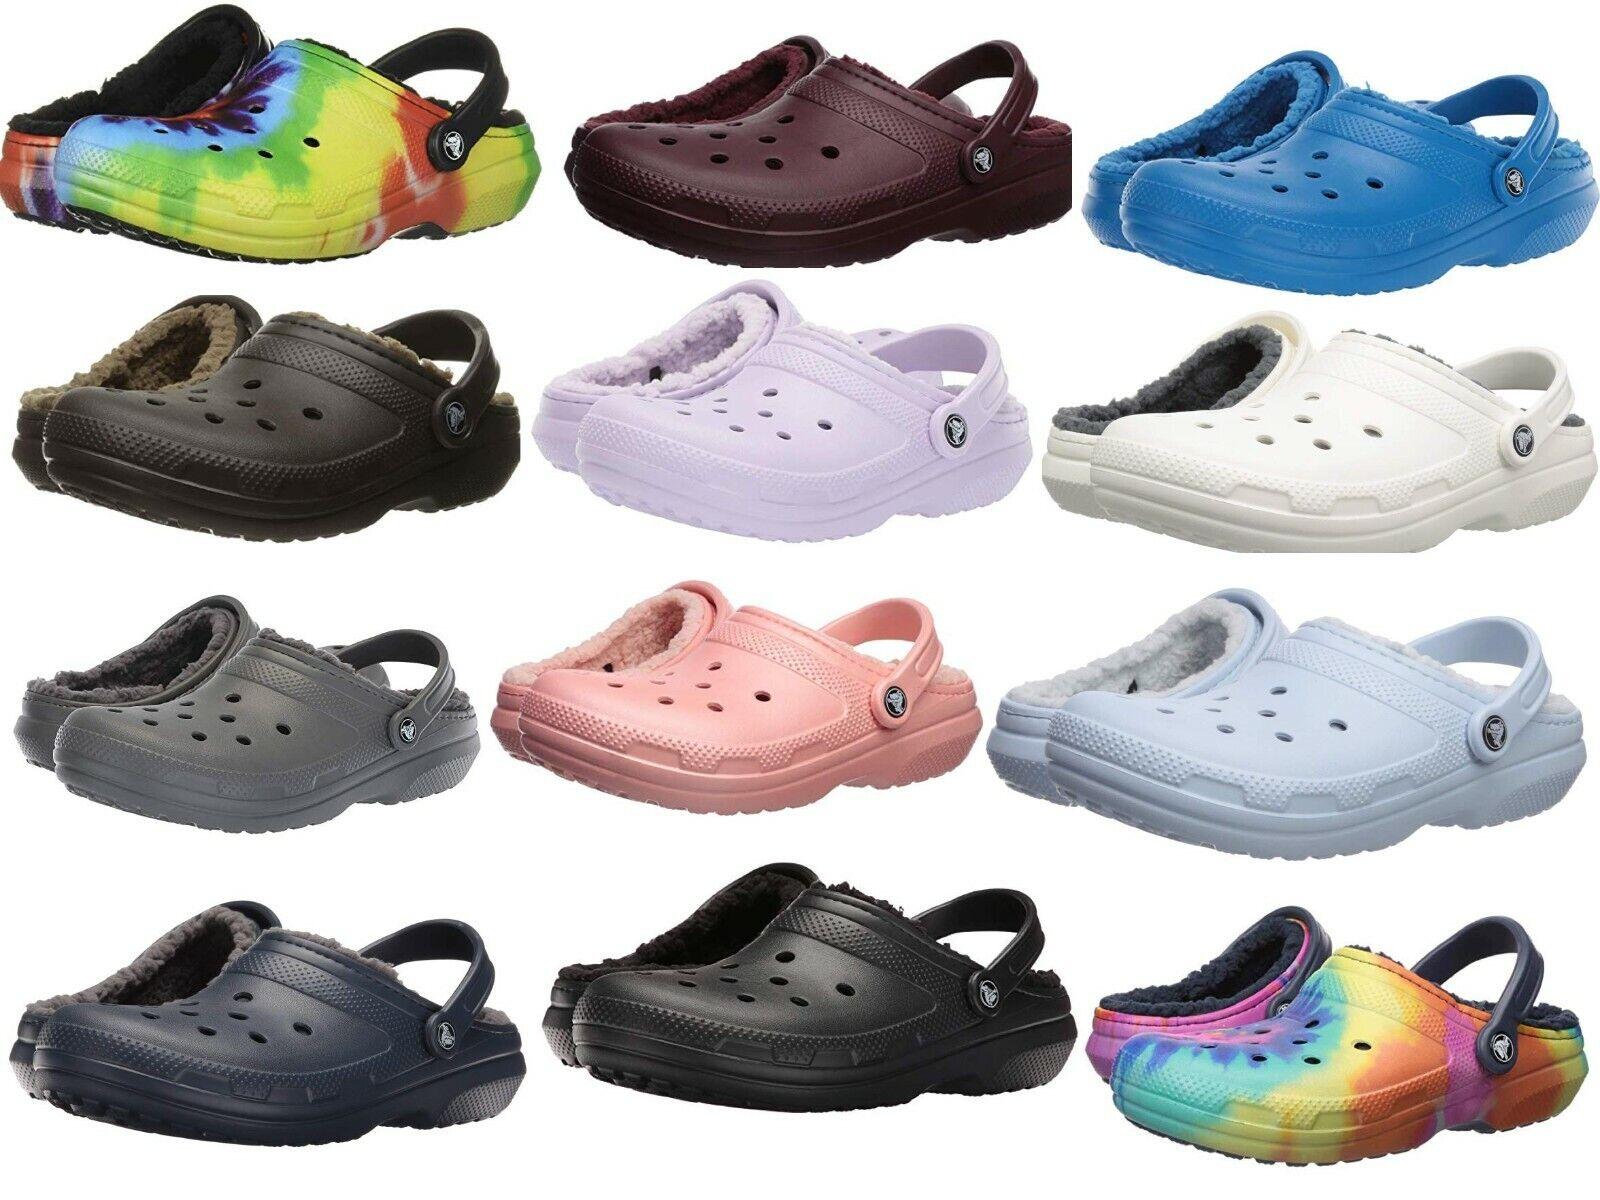 Crocs Classic Cayman Clogs White